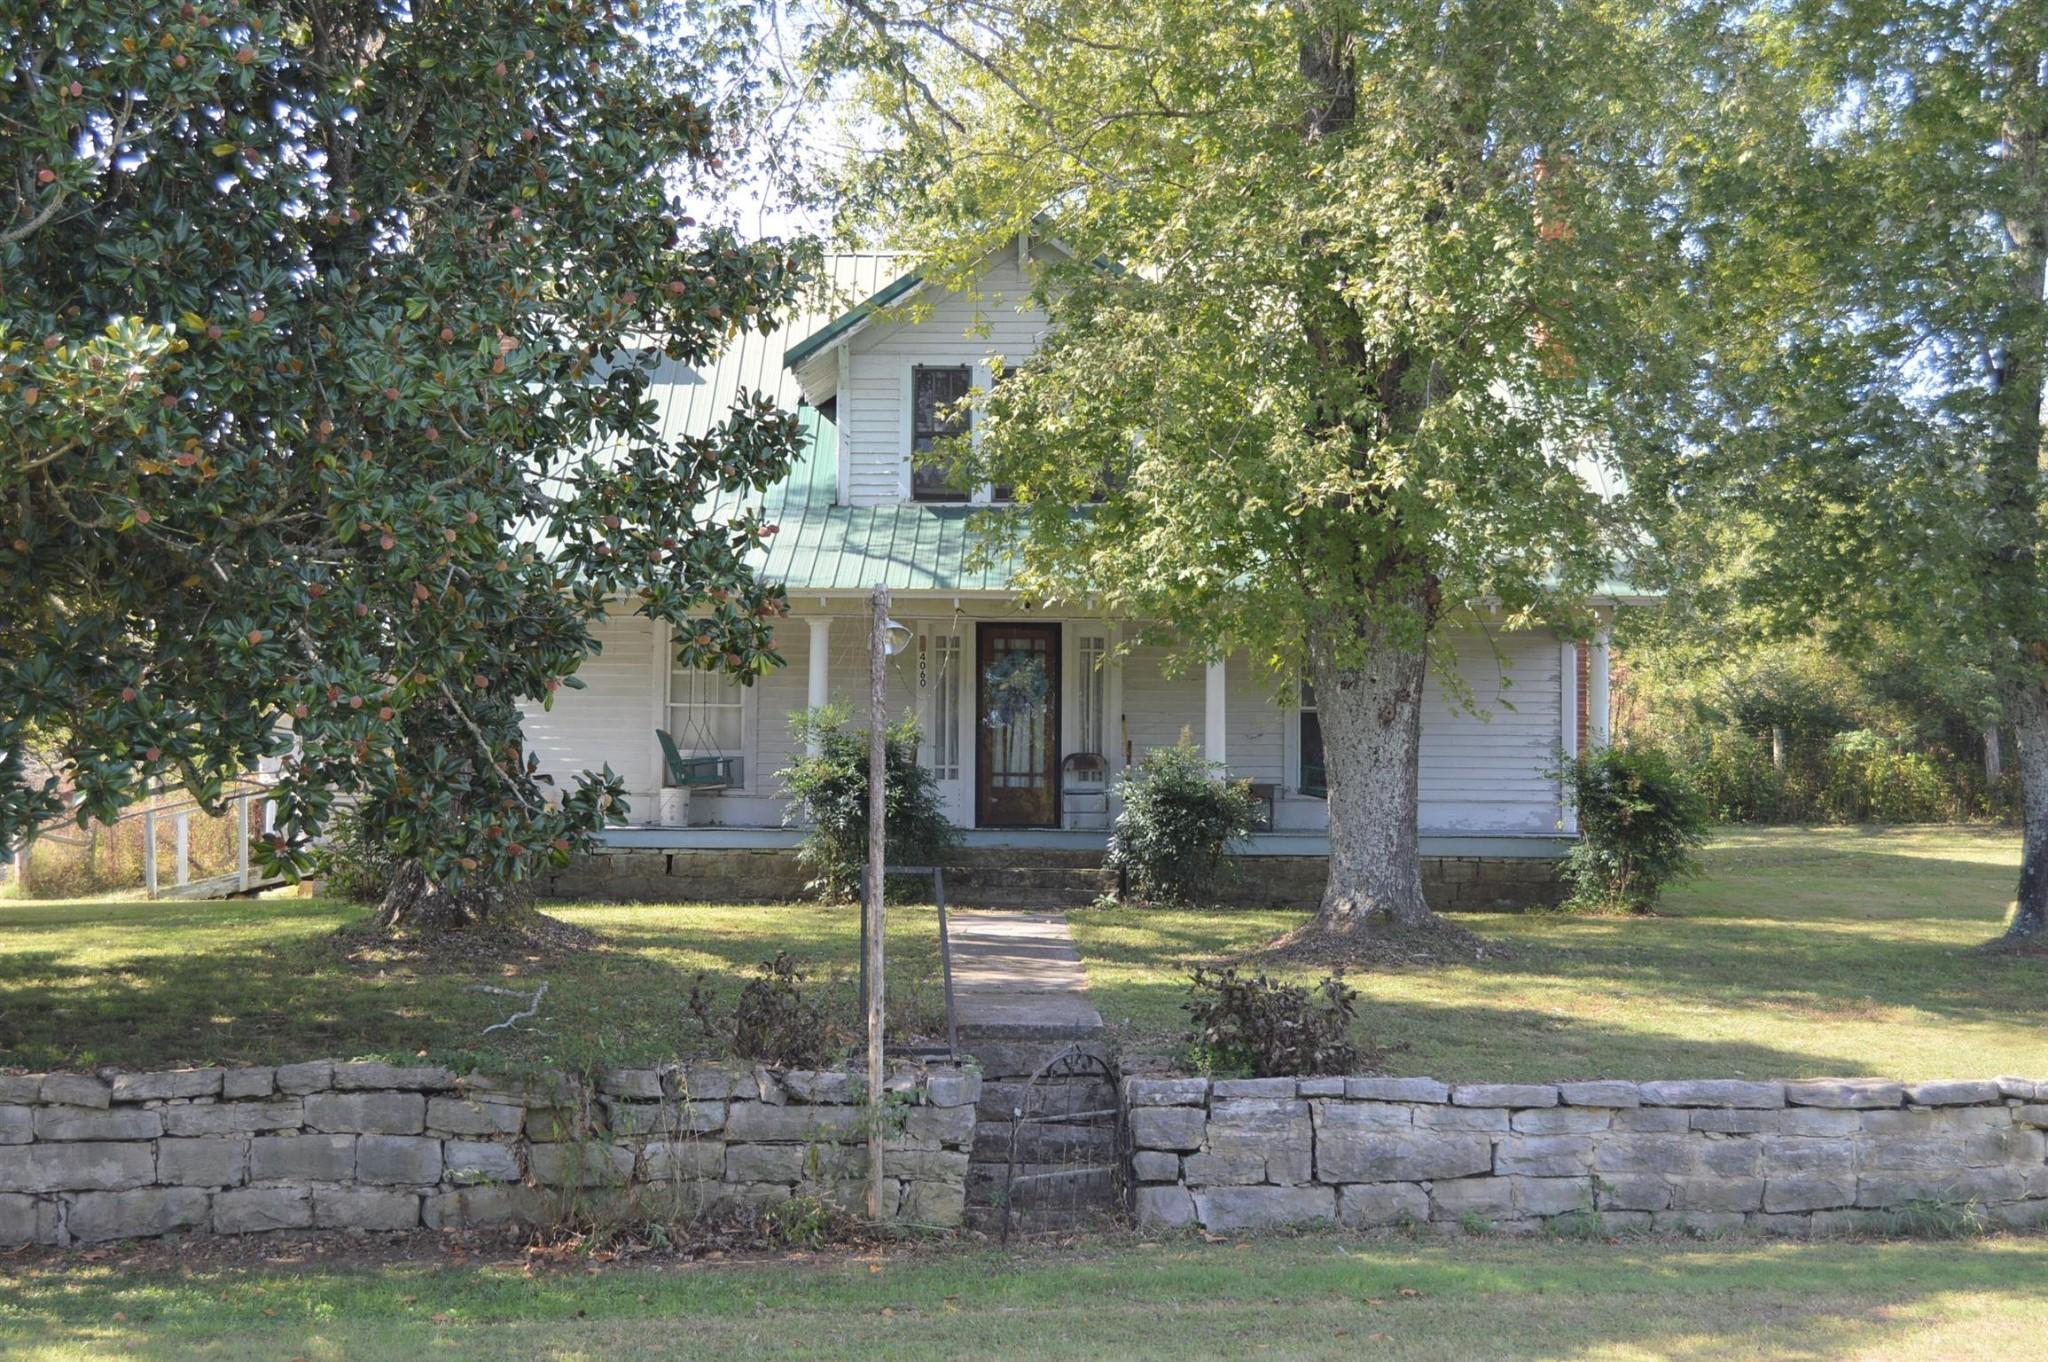 4060 John Barnes Rd Property Photo - Cornersville, TN real estate listing